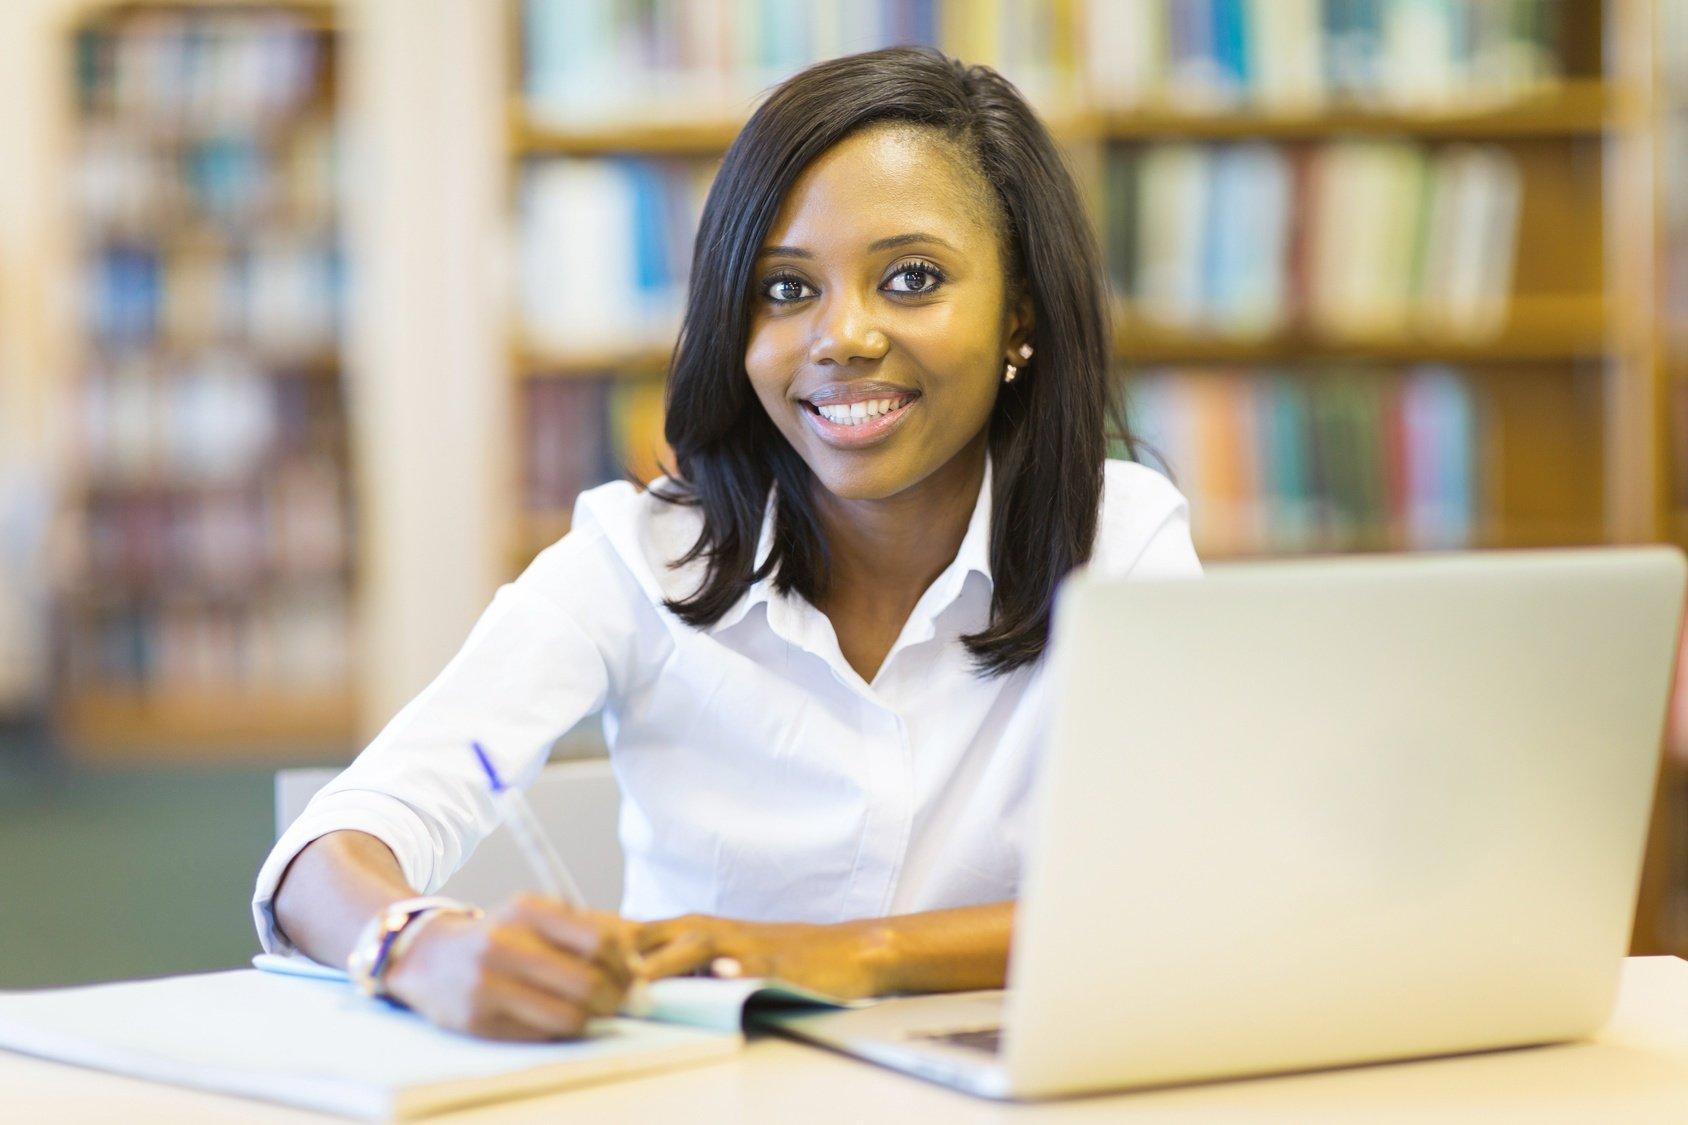 College Essay Resources